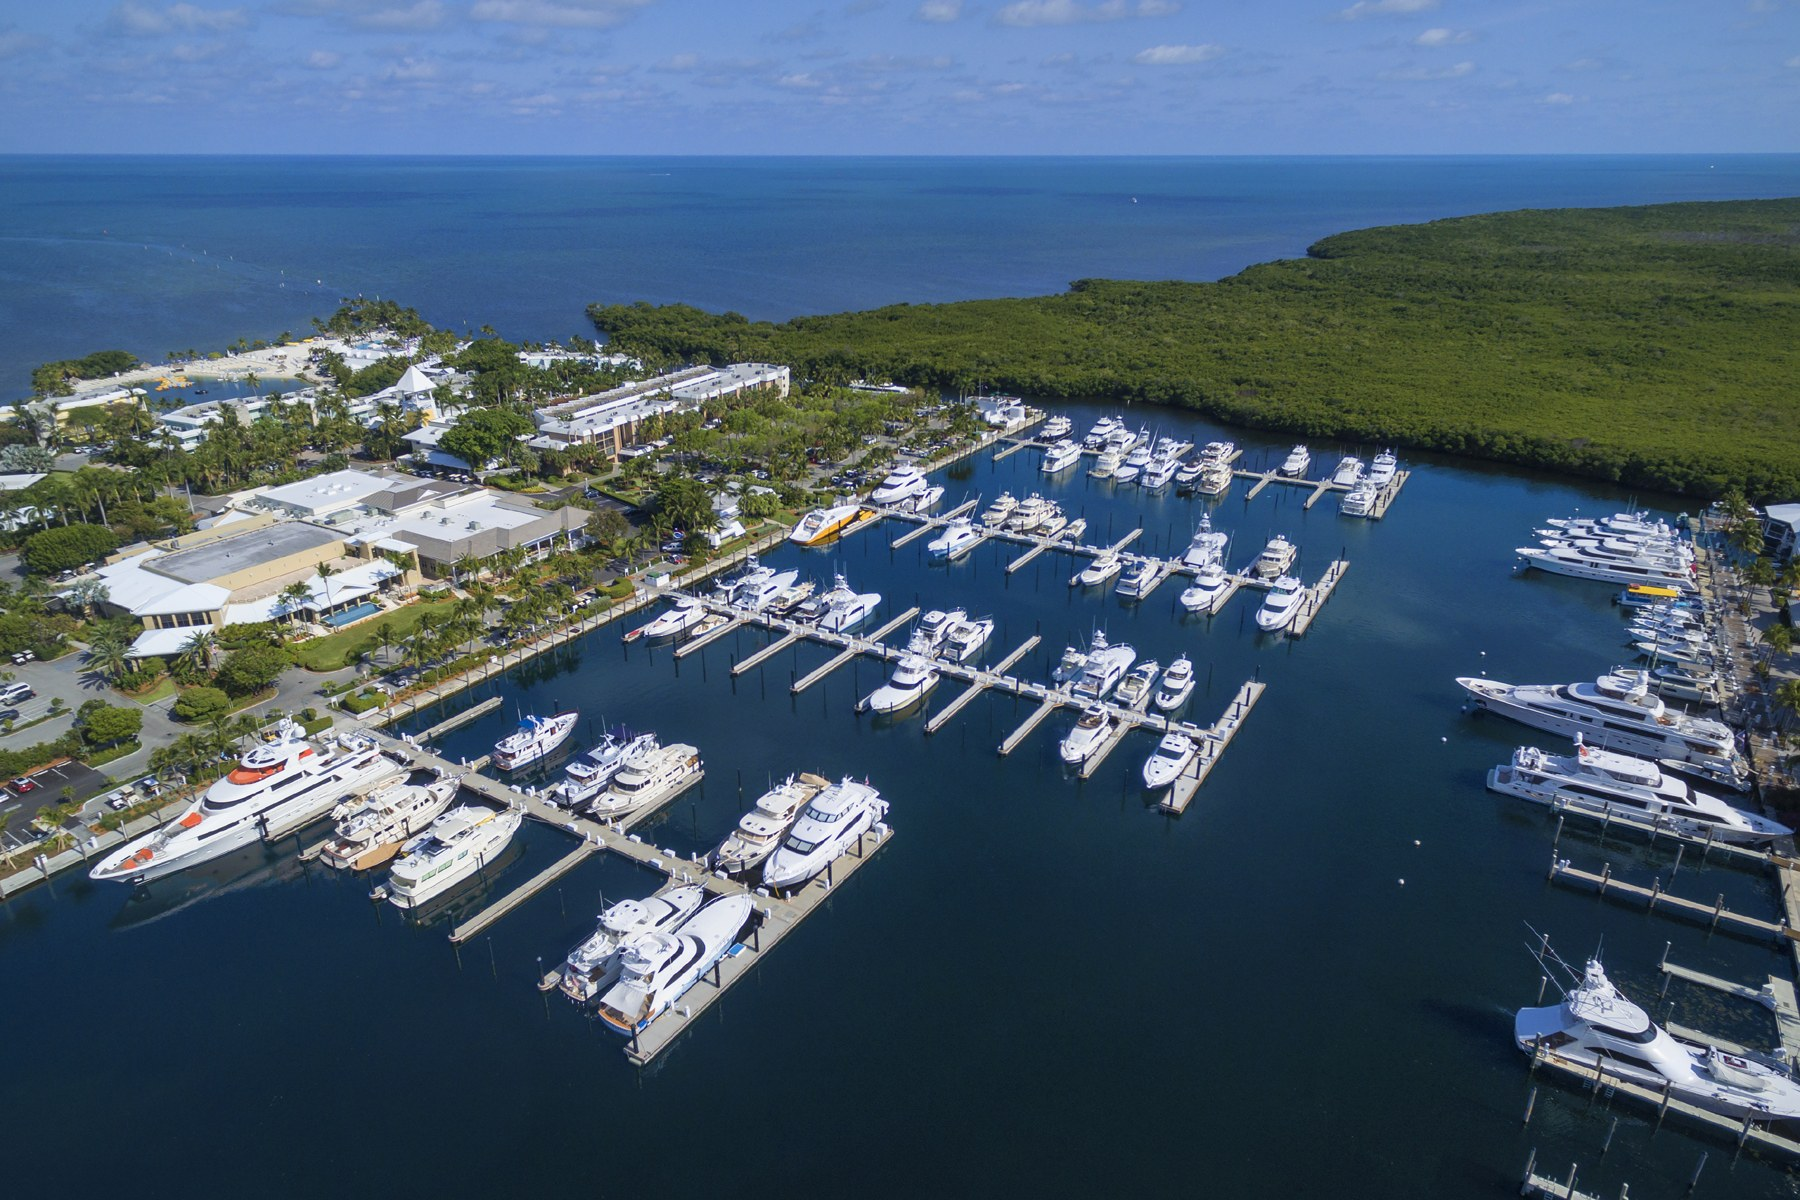 for Sale at 201 Ocean Reef Drive, #FS-29, Key Largo, FL 201 Ocean Reef Drive, FS-29 Key Largo, Florida 33037 United States